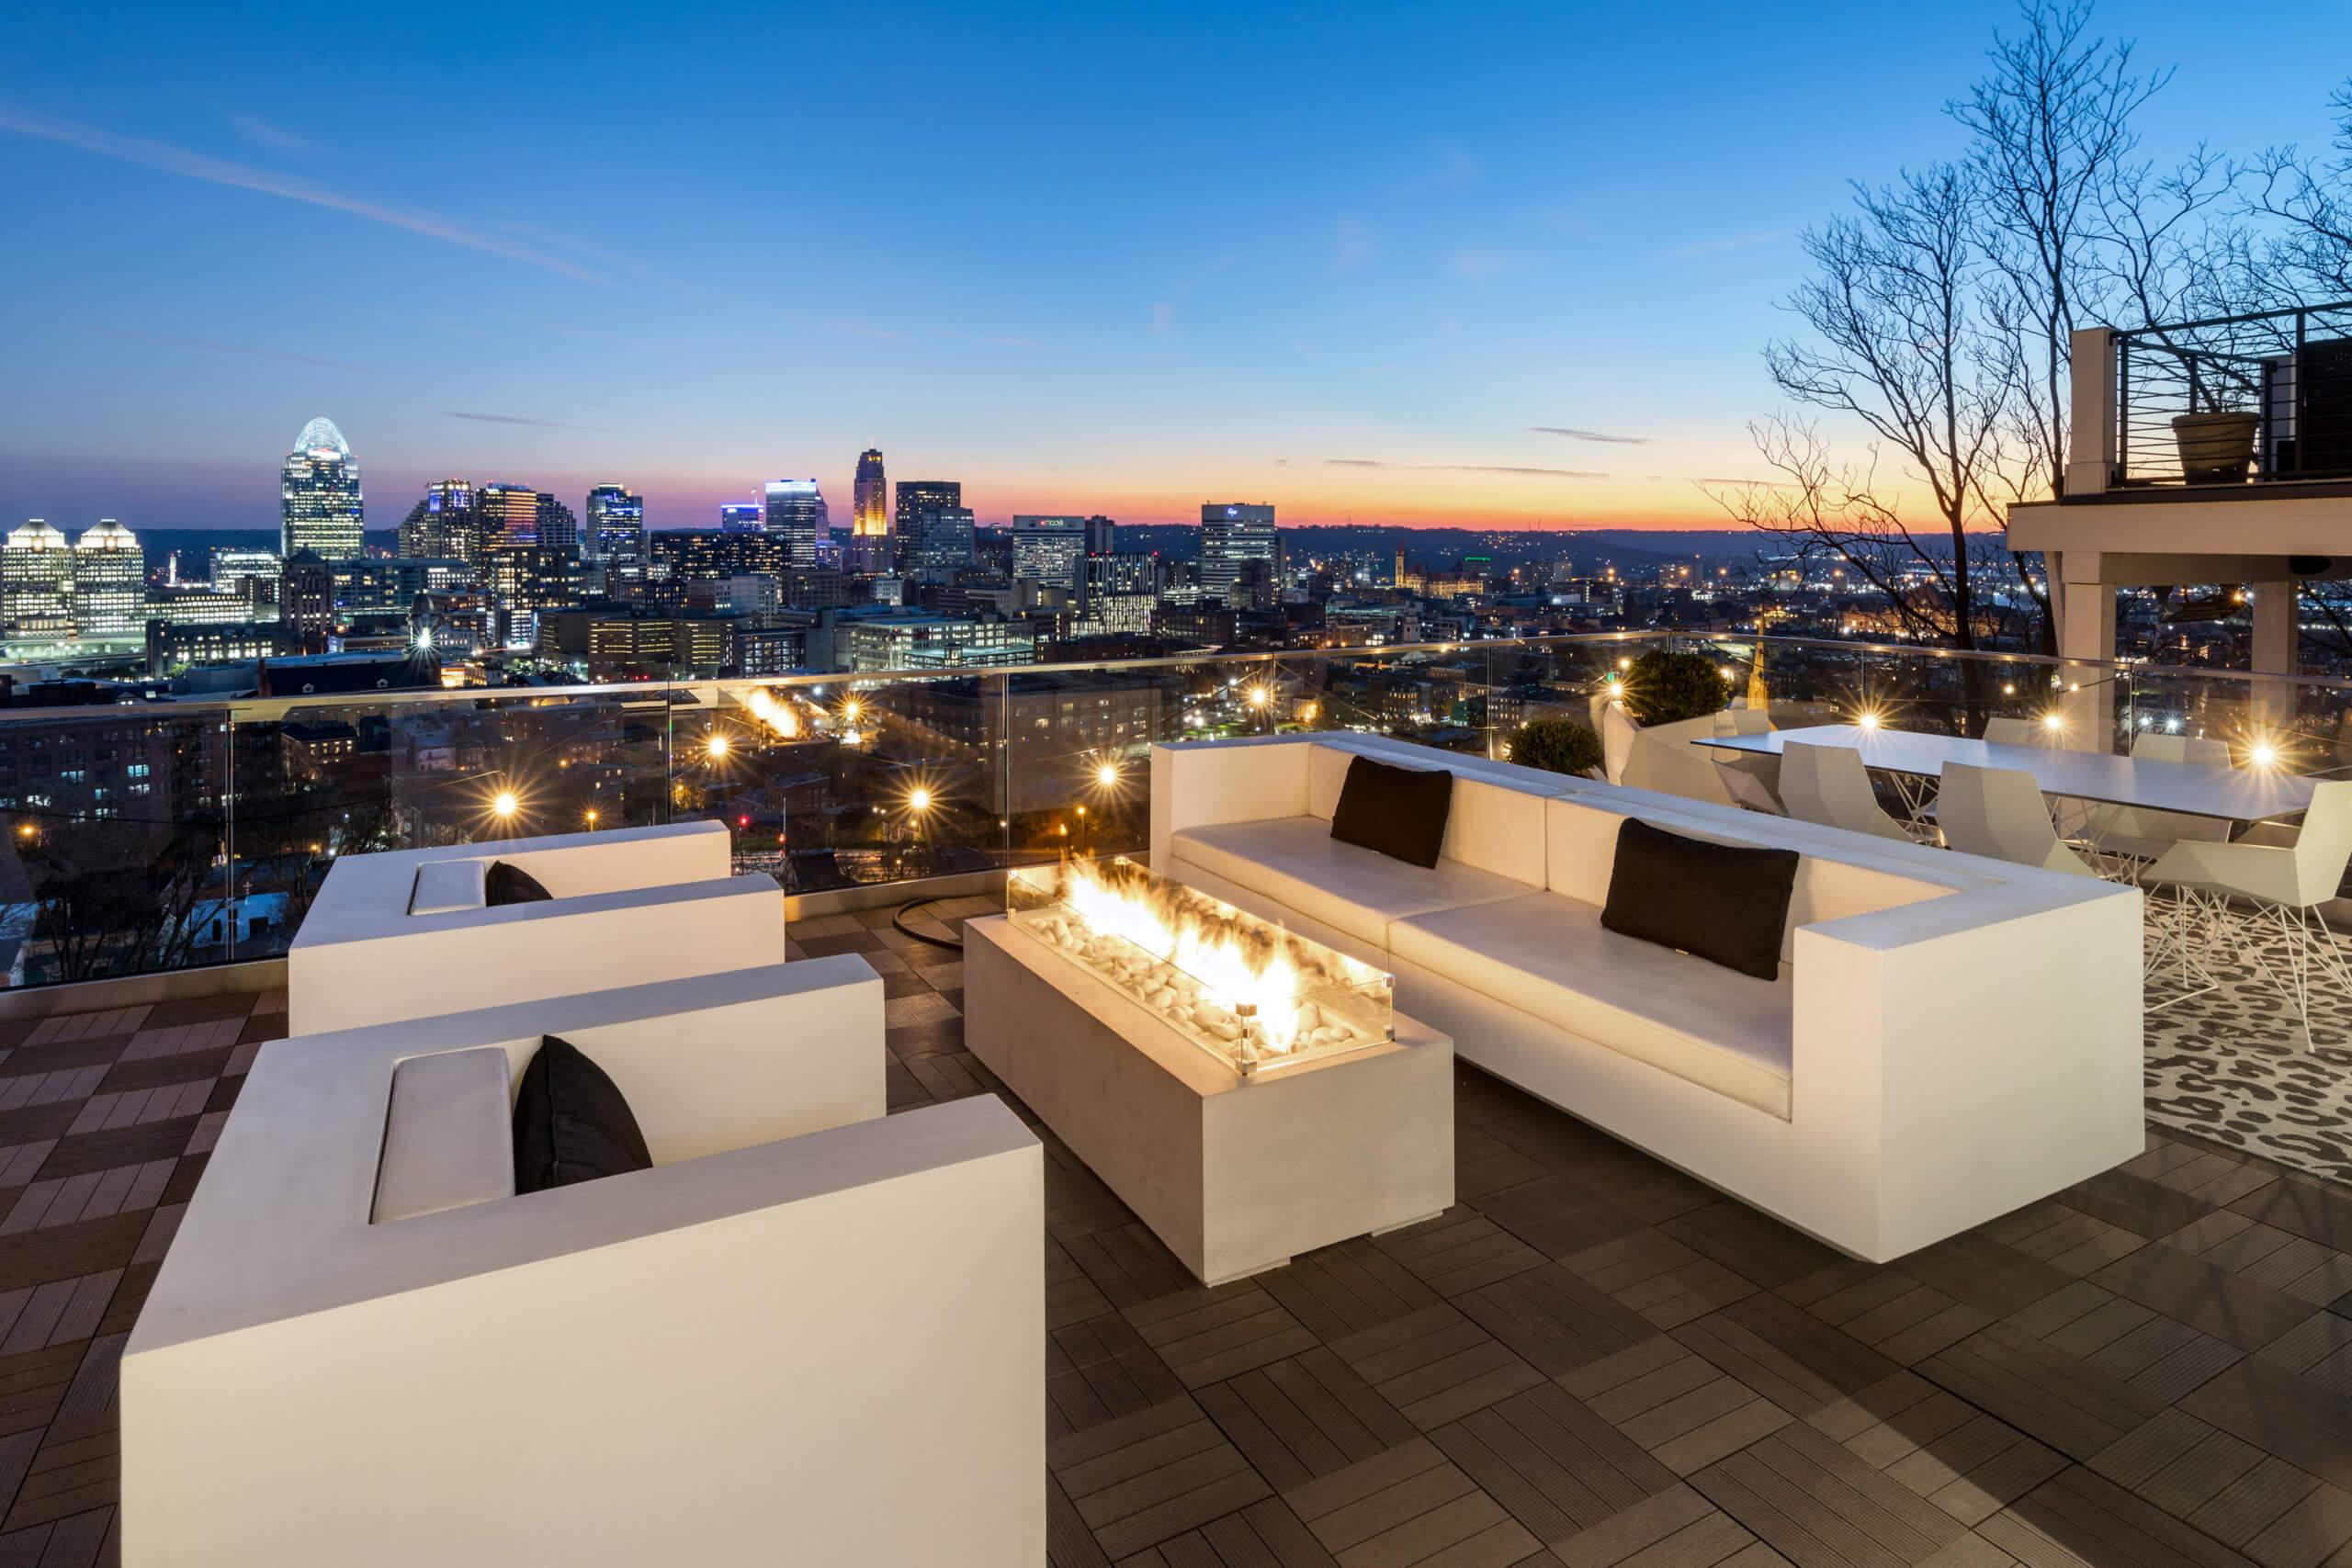 Contemporary Rooftop Design by Cincinnati Interior Designer RM Interiors with Skyline View